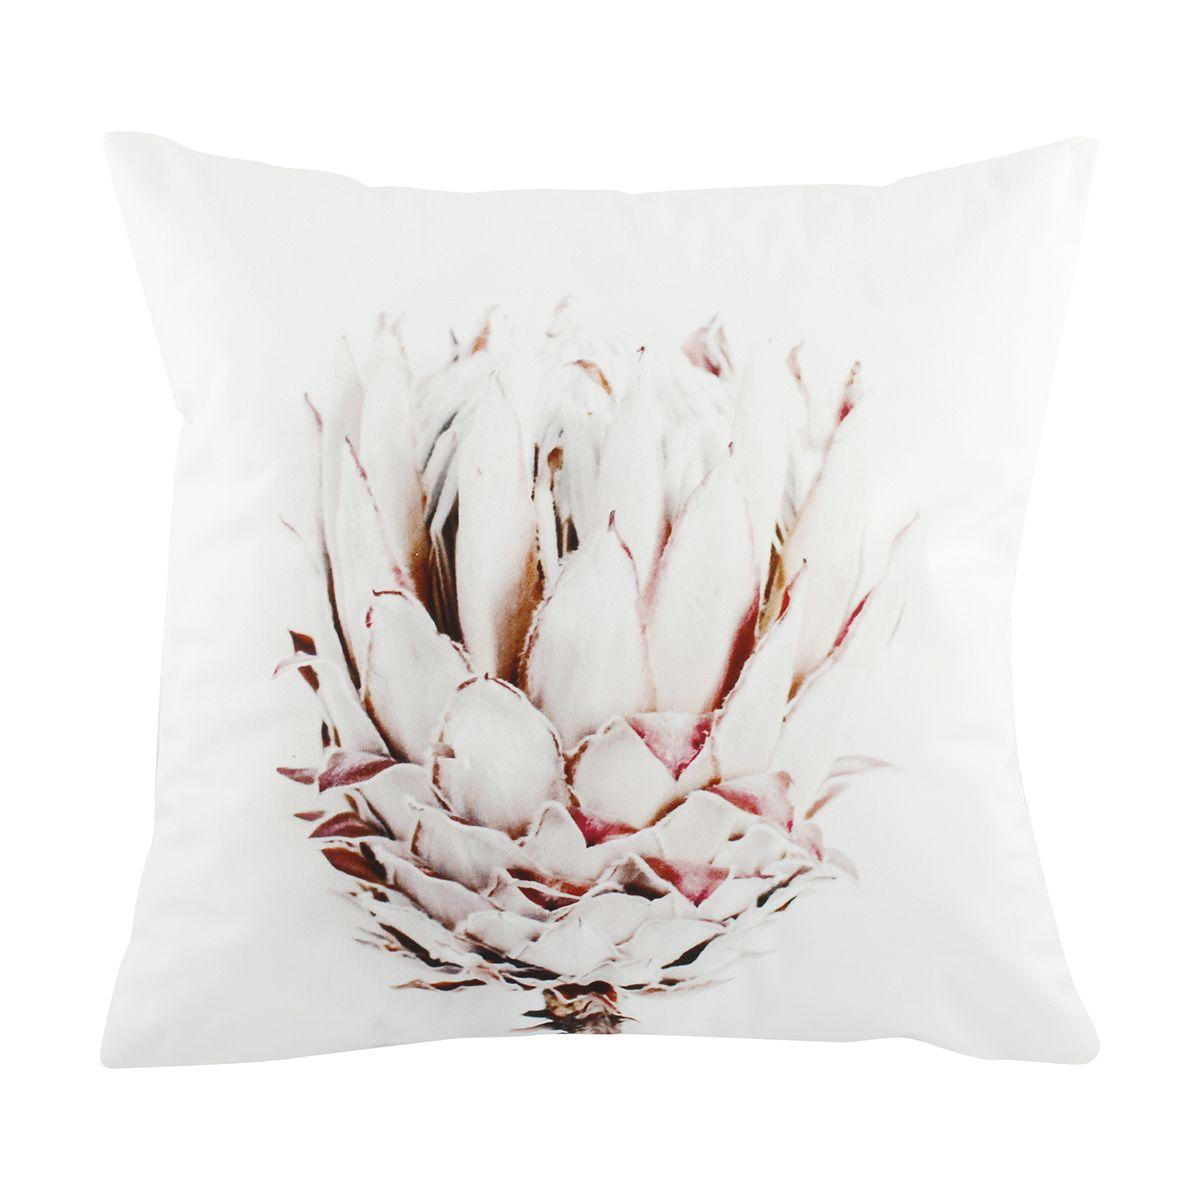 Protea Cushion Kmart Cushions Decor Decorative Cushions